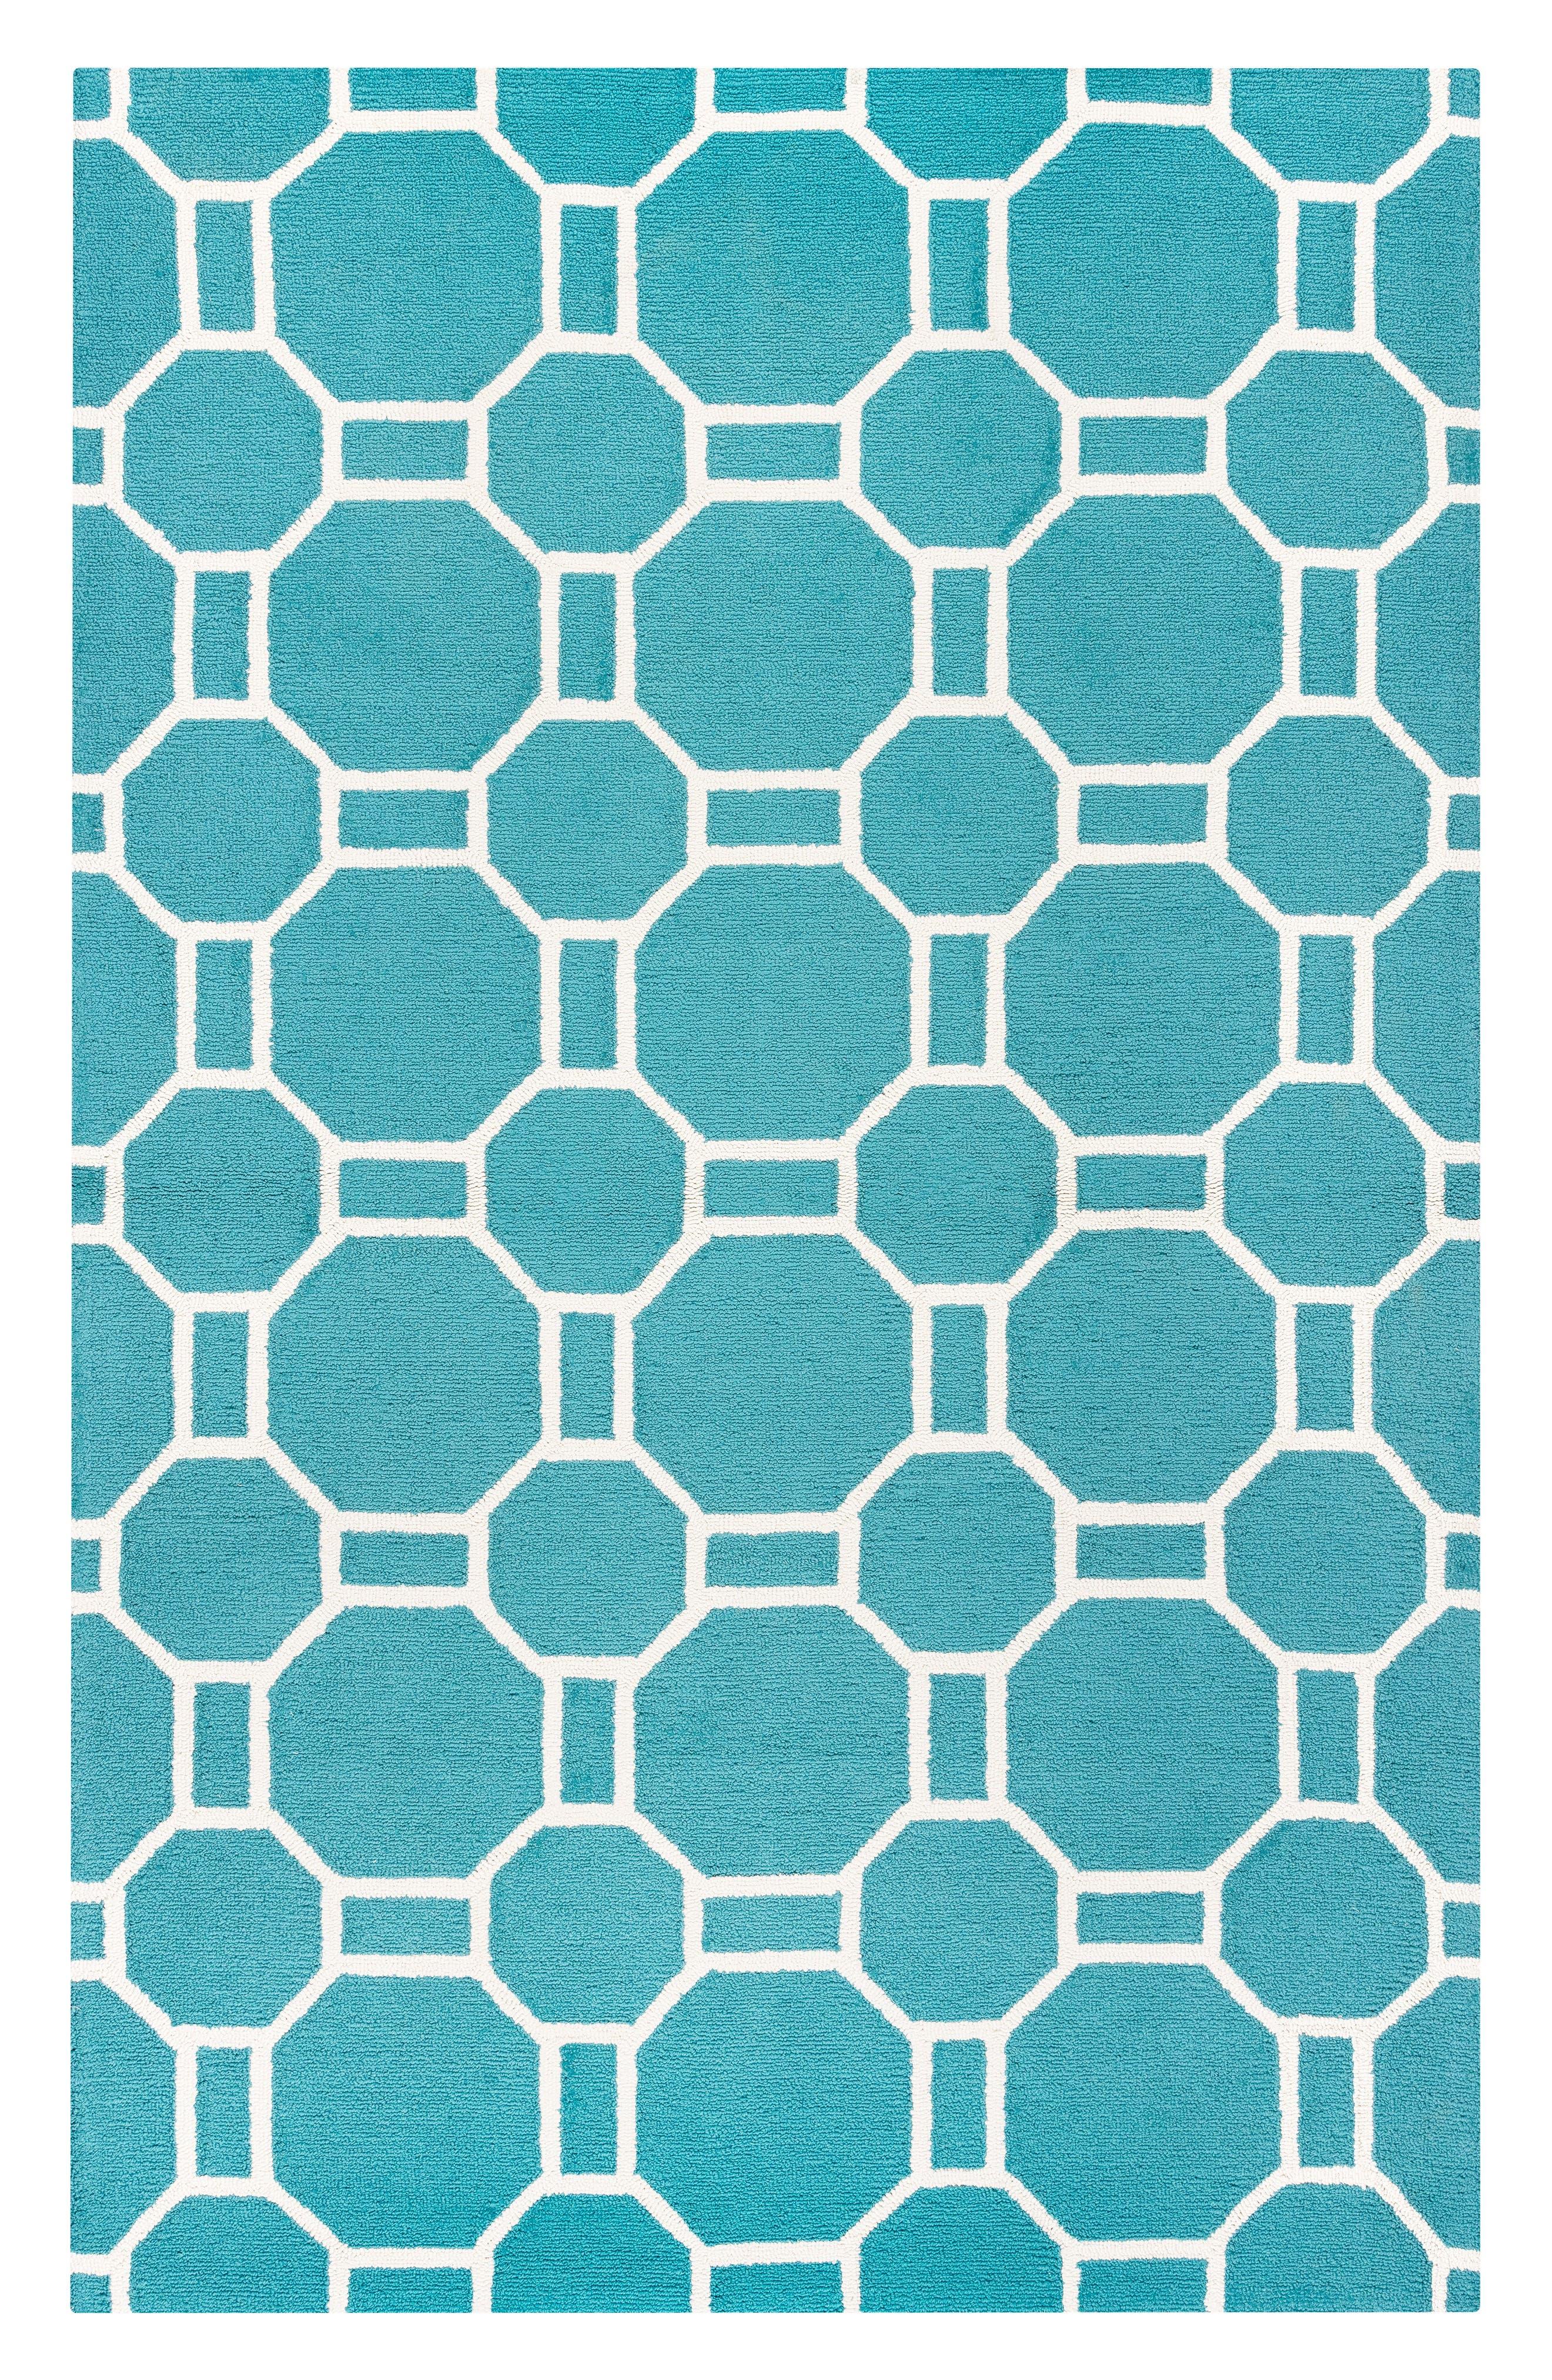 Azzura Hill Elisa Rug,                             Main thumbnail 1, color,                             Teal